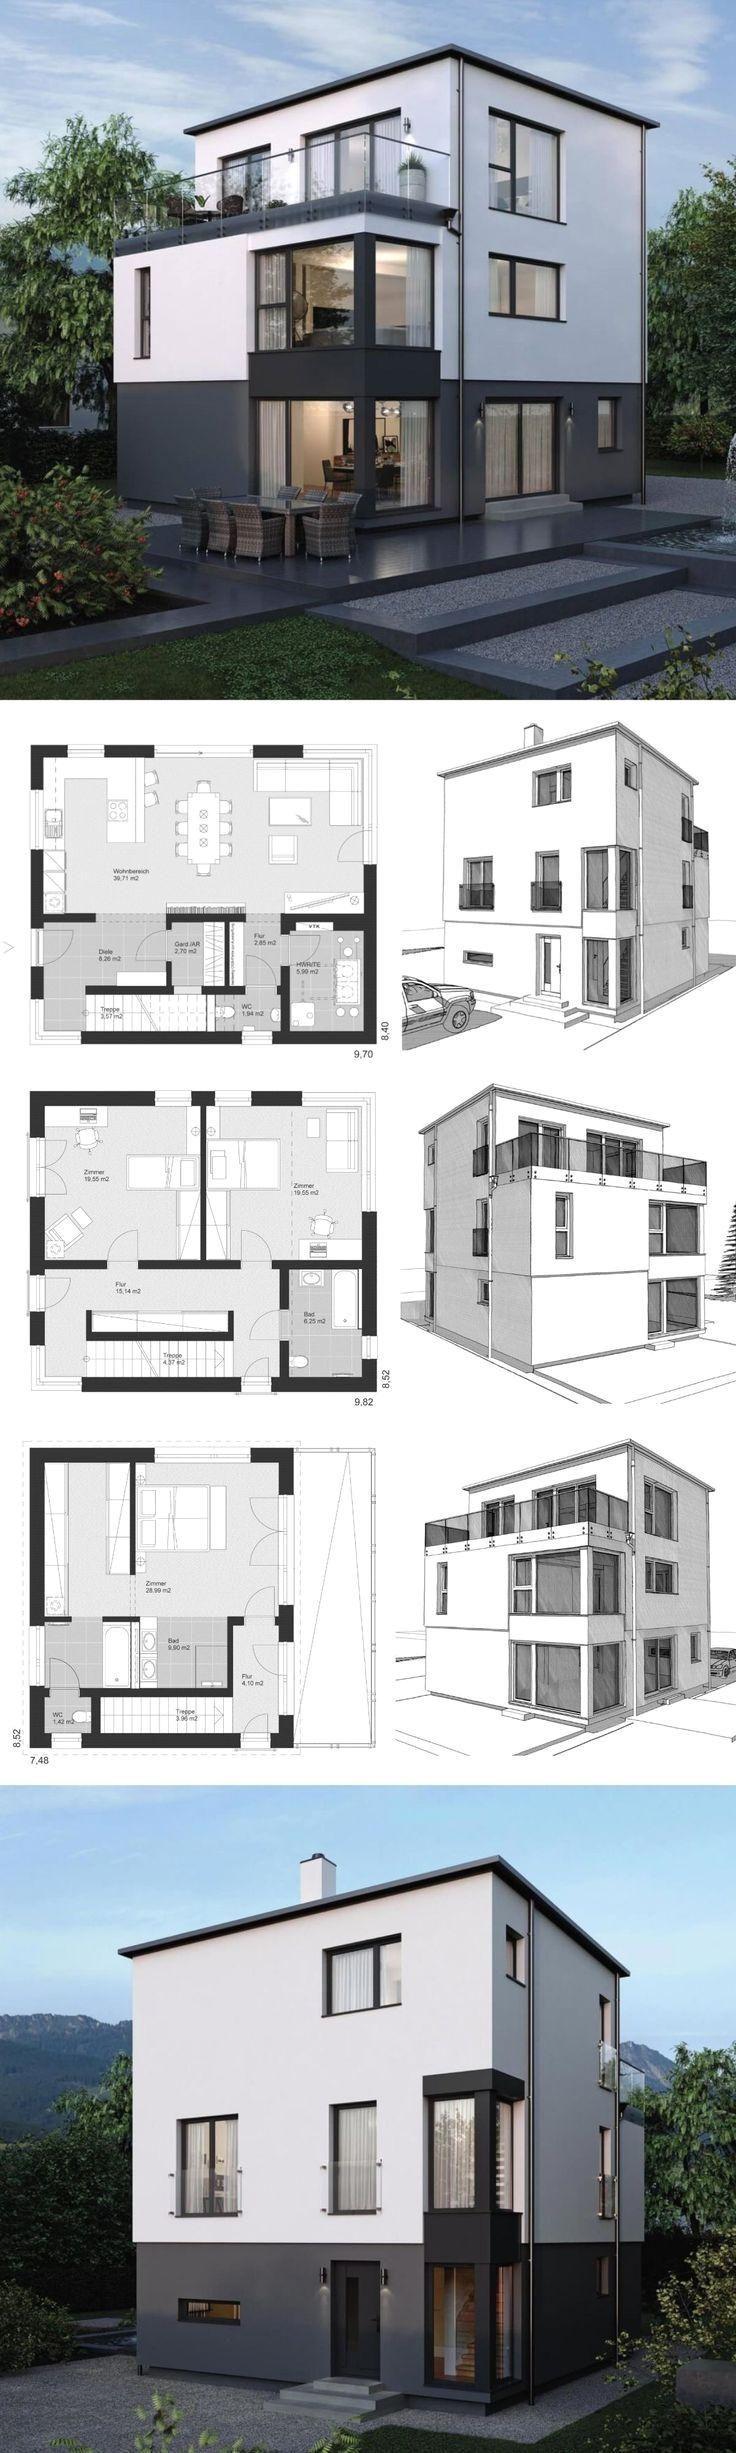 #home #house #houseplan #dreamhome #newhome #homedesi